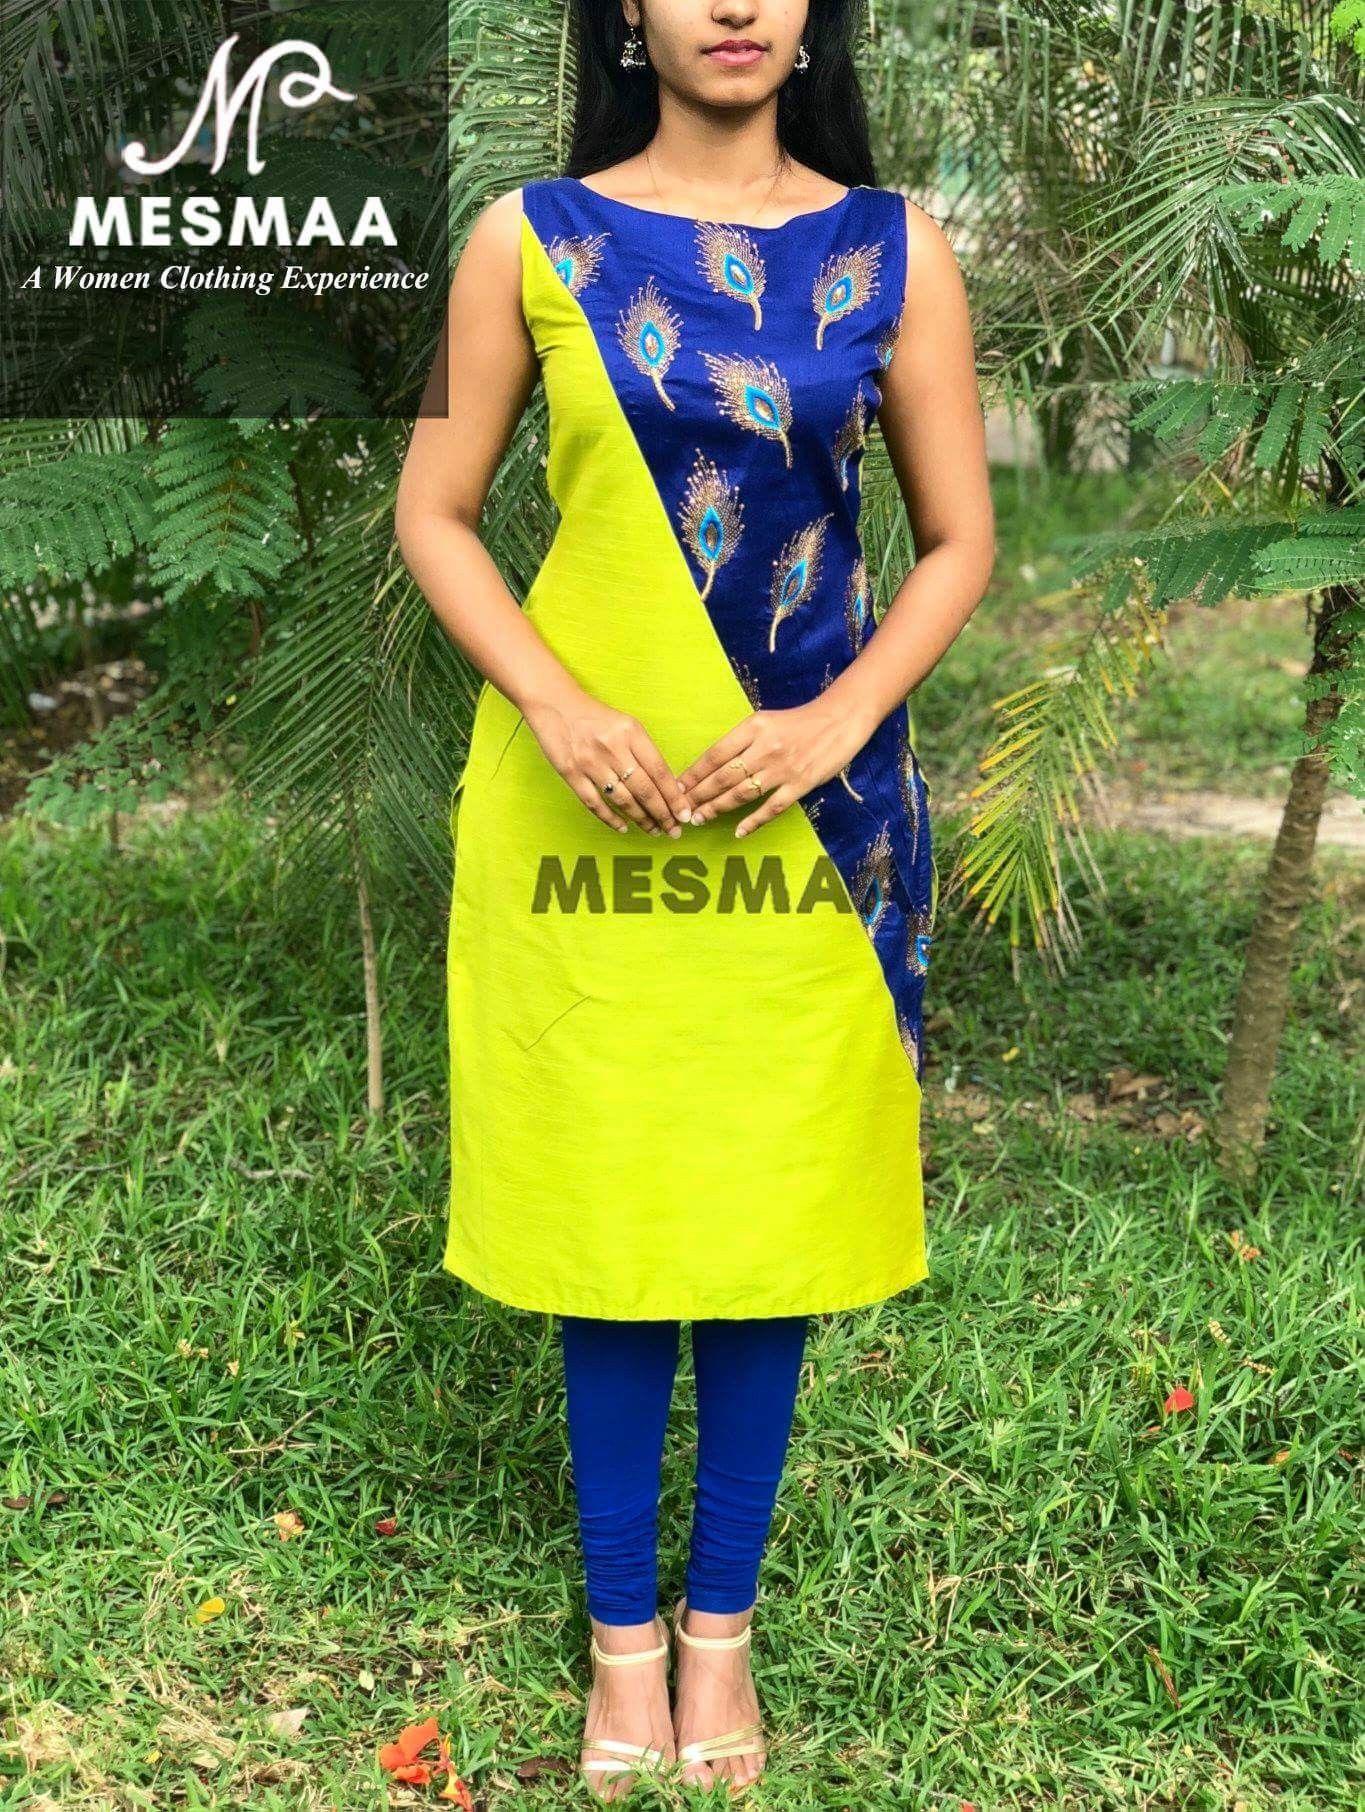 dccb312cce539 @priti93 Churidar Neck Designs, Kurta Neck Design, Salwar Designs, Chudi  Neck Designs